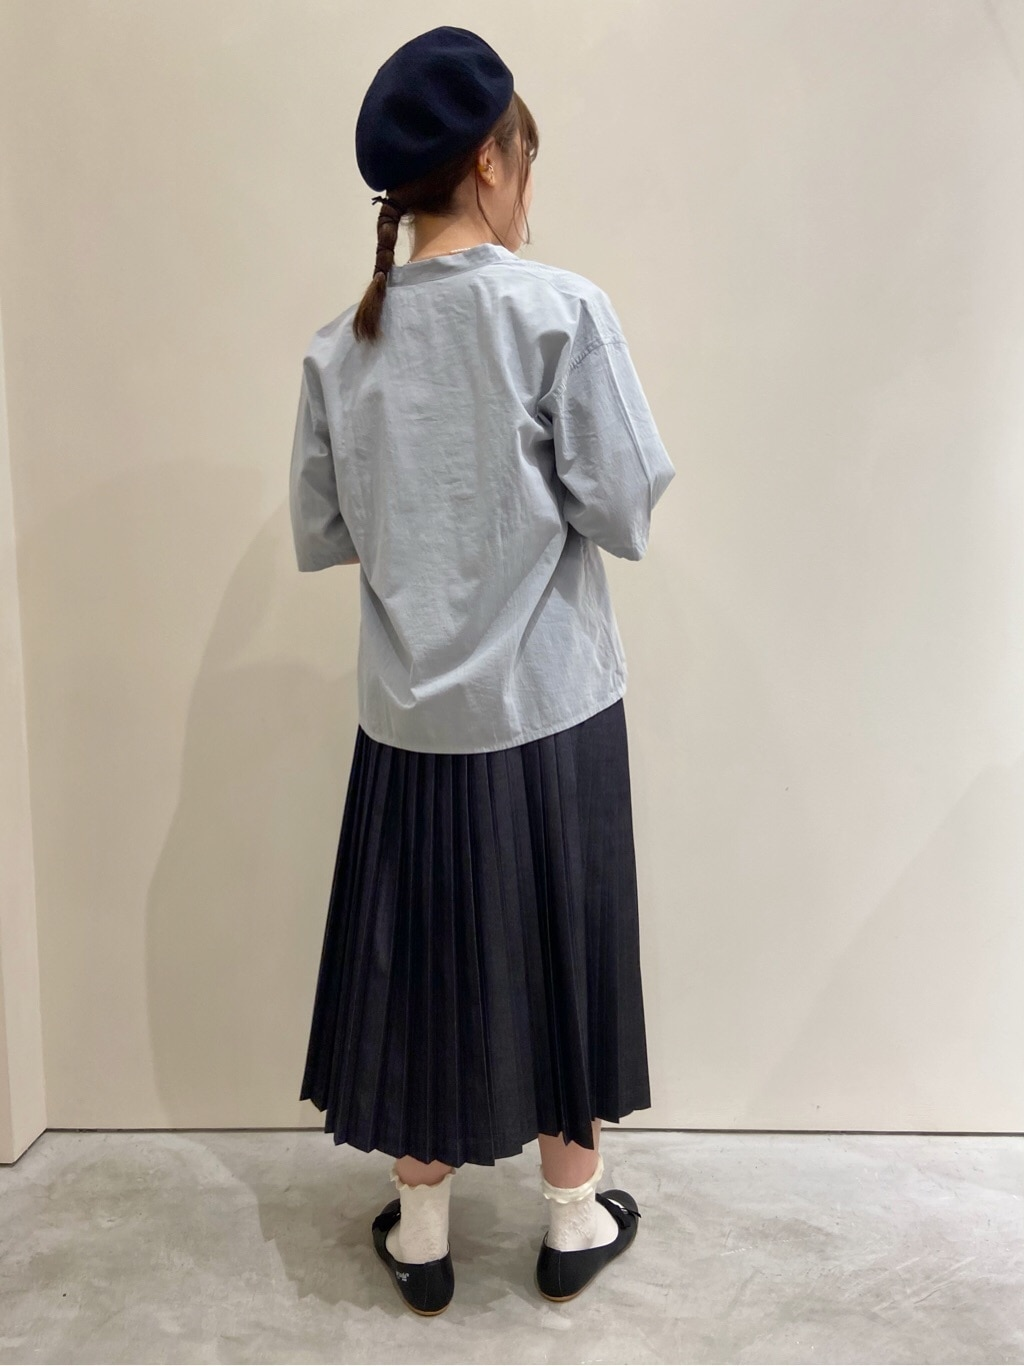 Dot and Stripes CHILD WOMAN CHILD WOMAN , PAR ICI 新宿ミロード 身長:160cm 2021.05.11